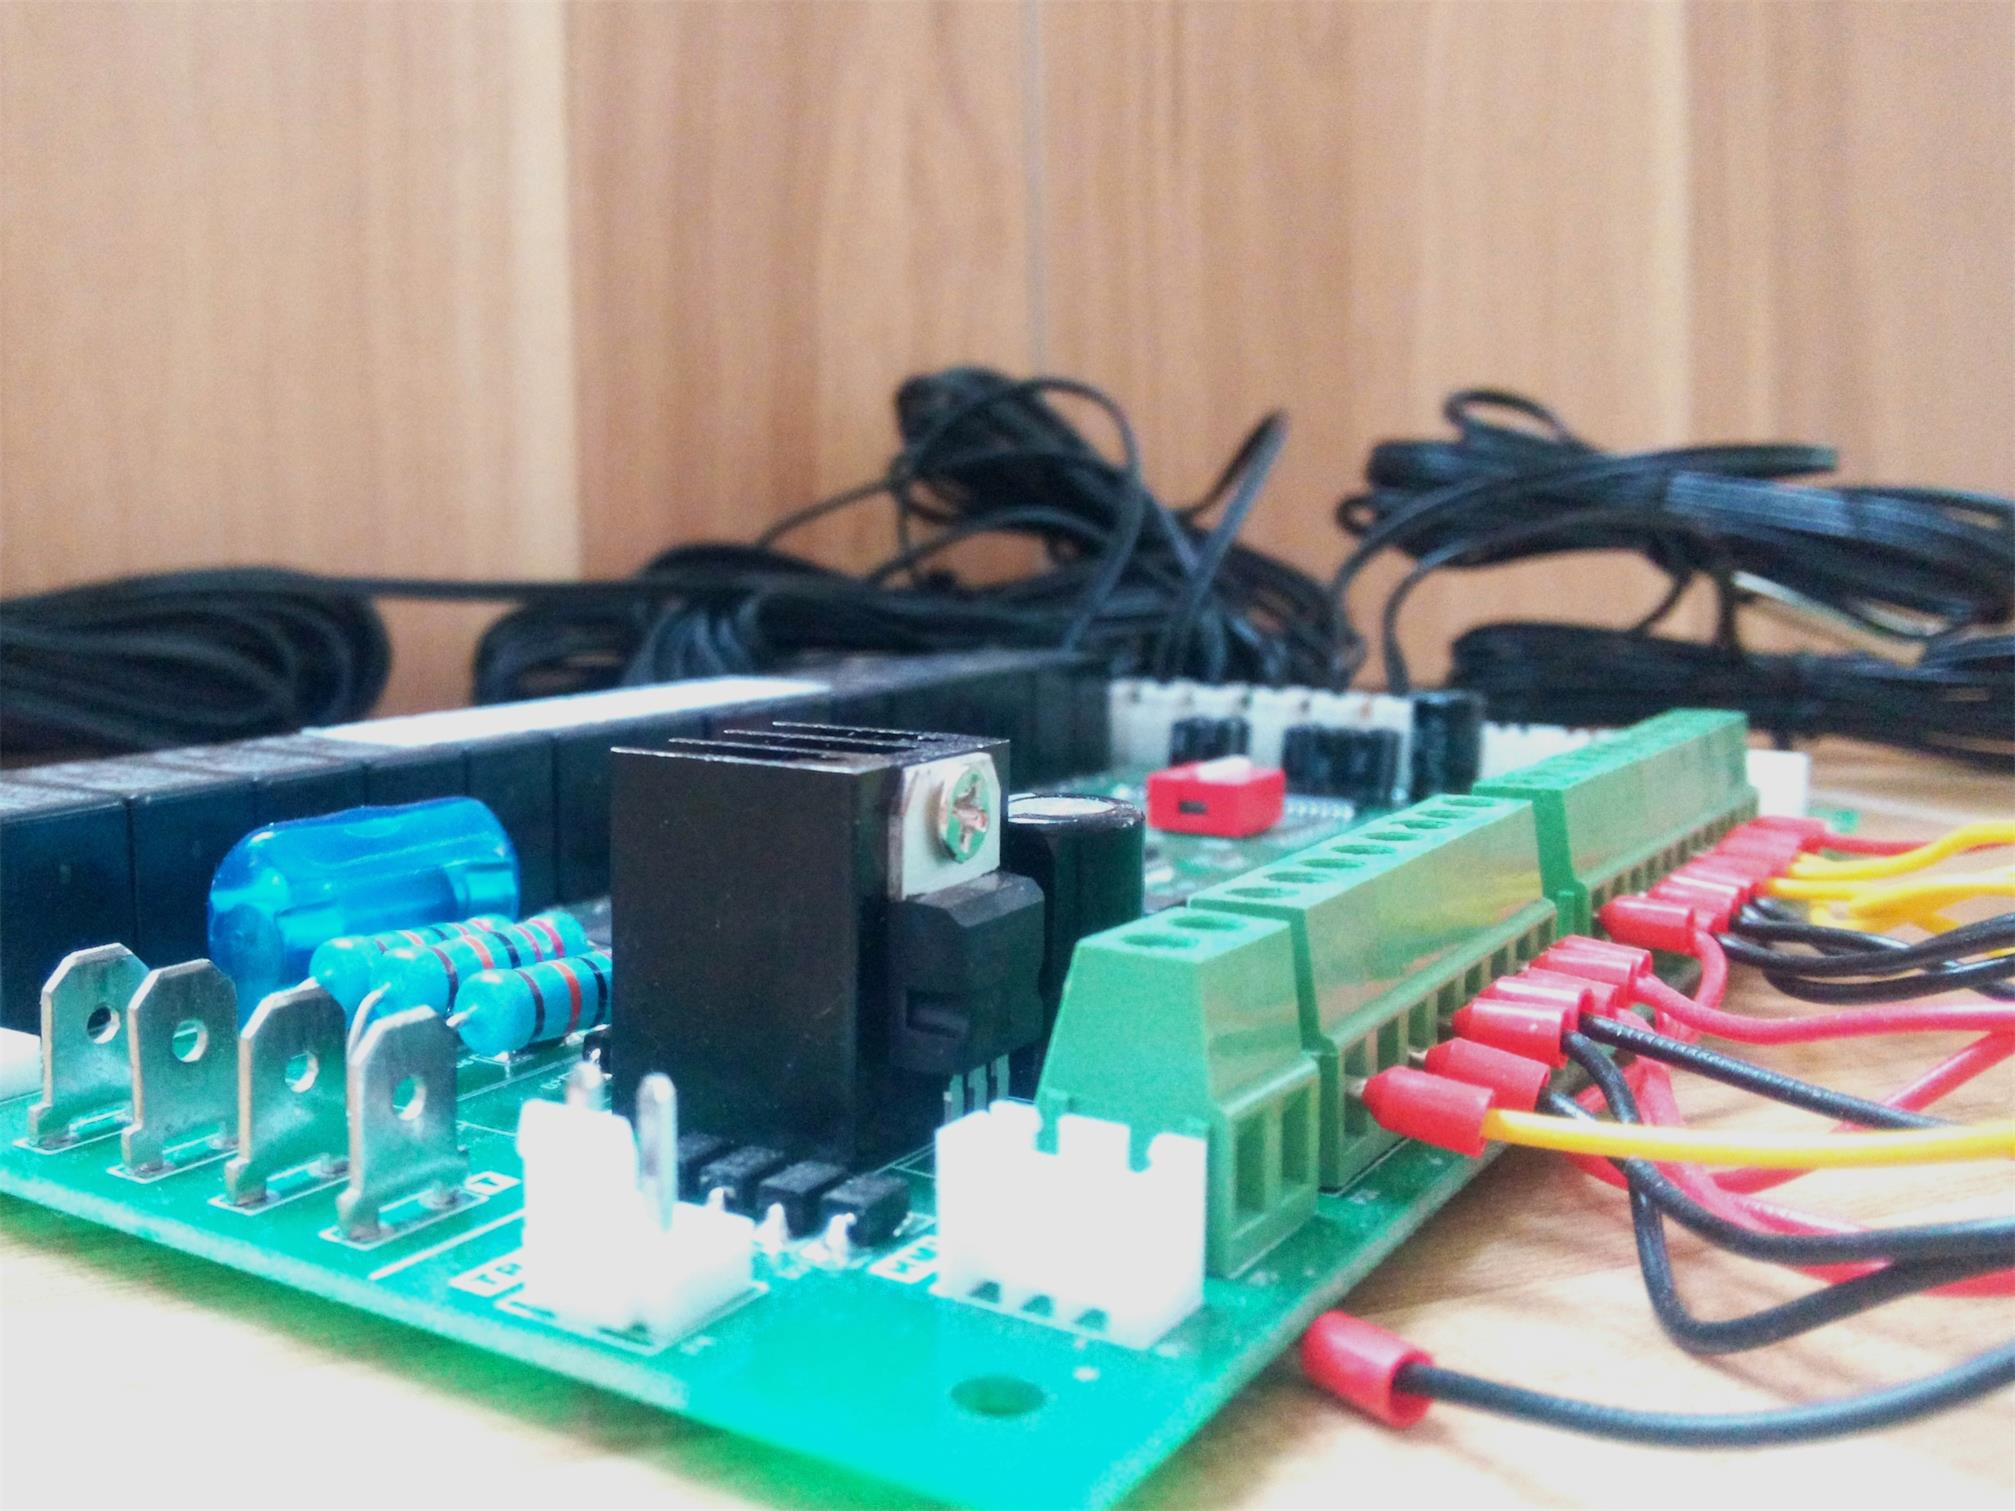 nac804-fs中央空调控制器 通用电子膨胀阀型四压机